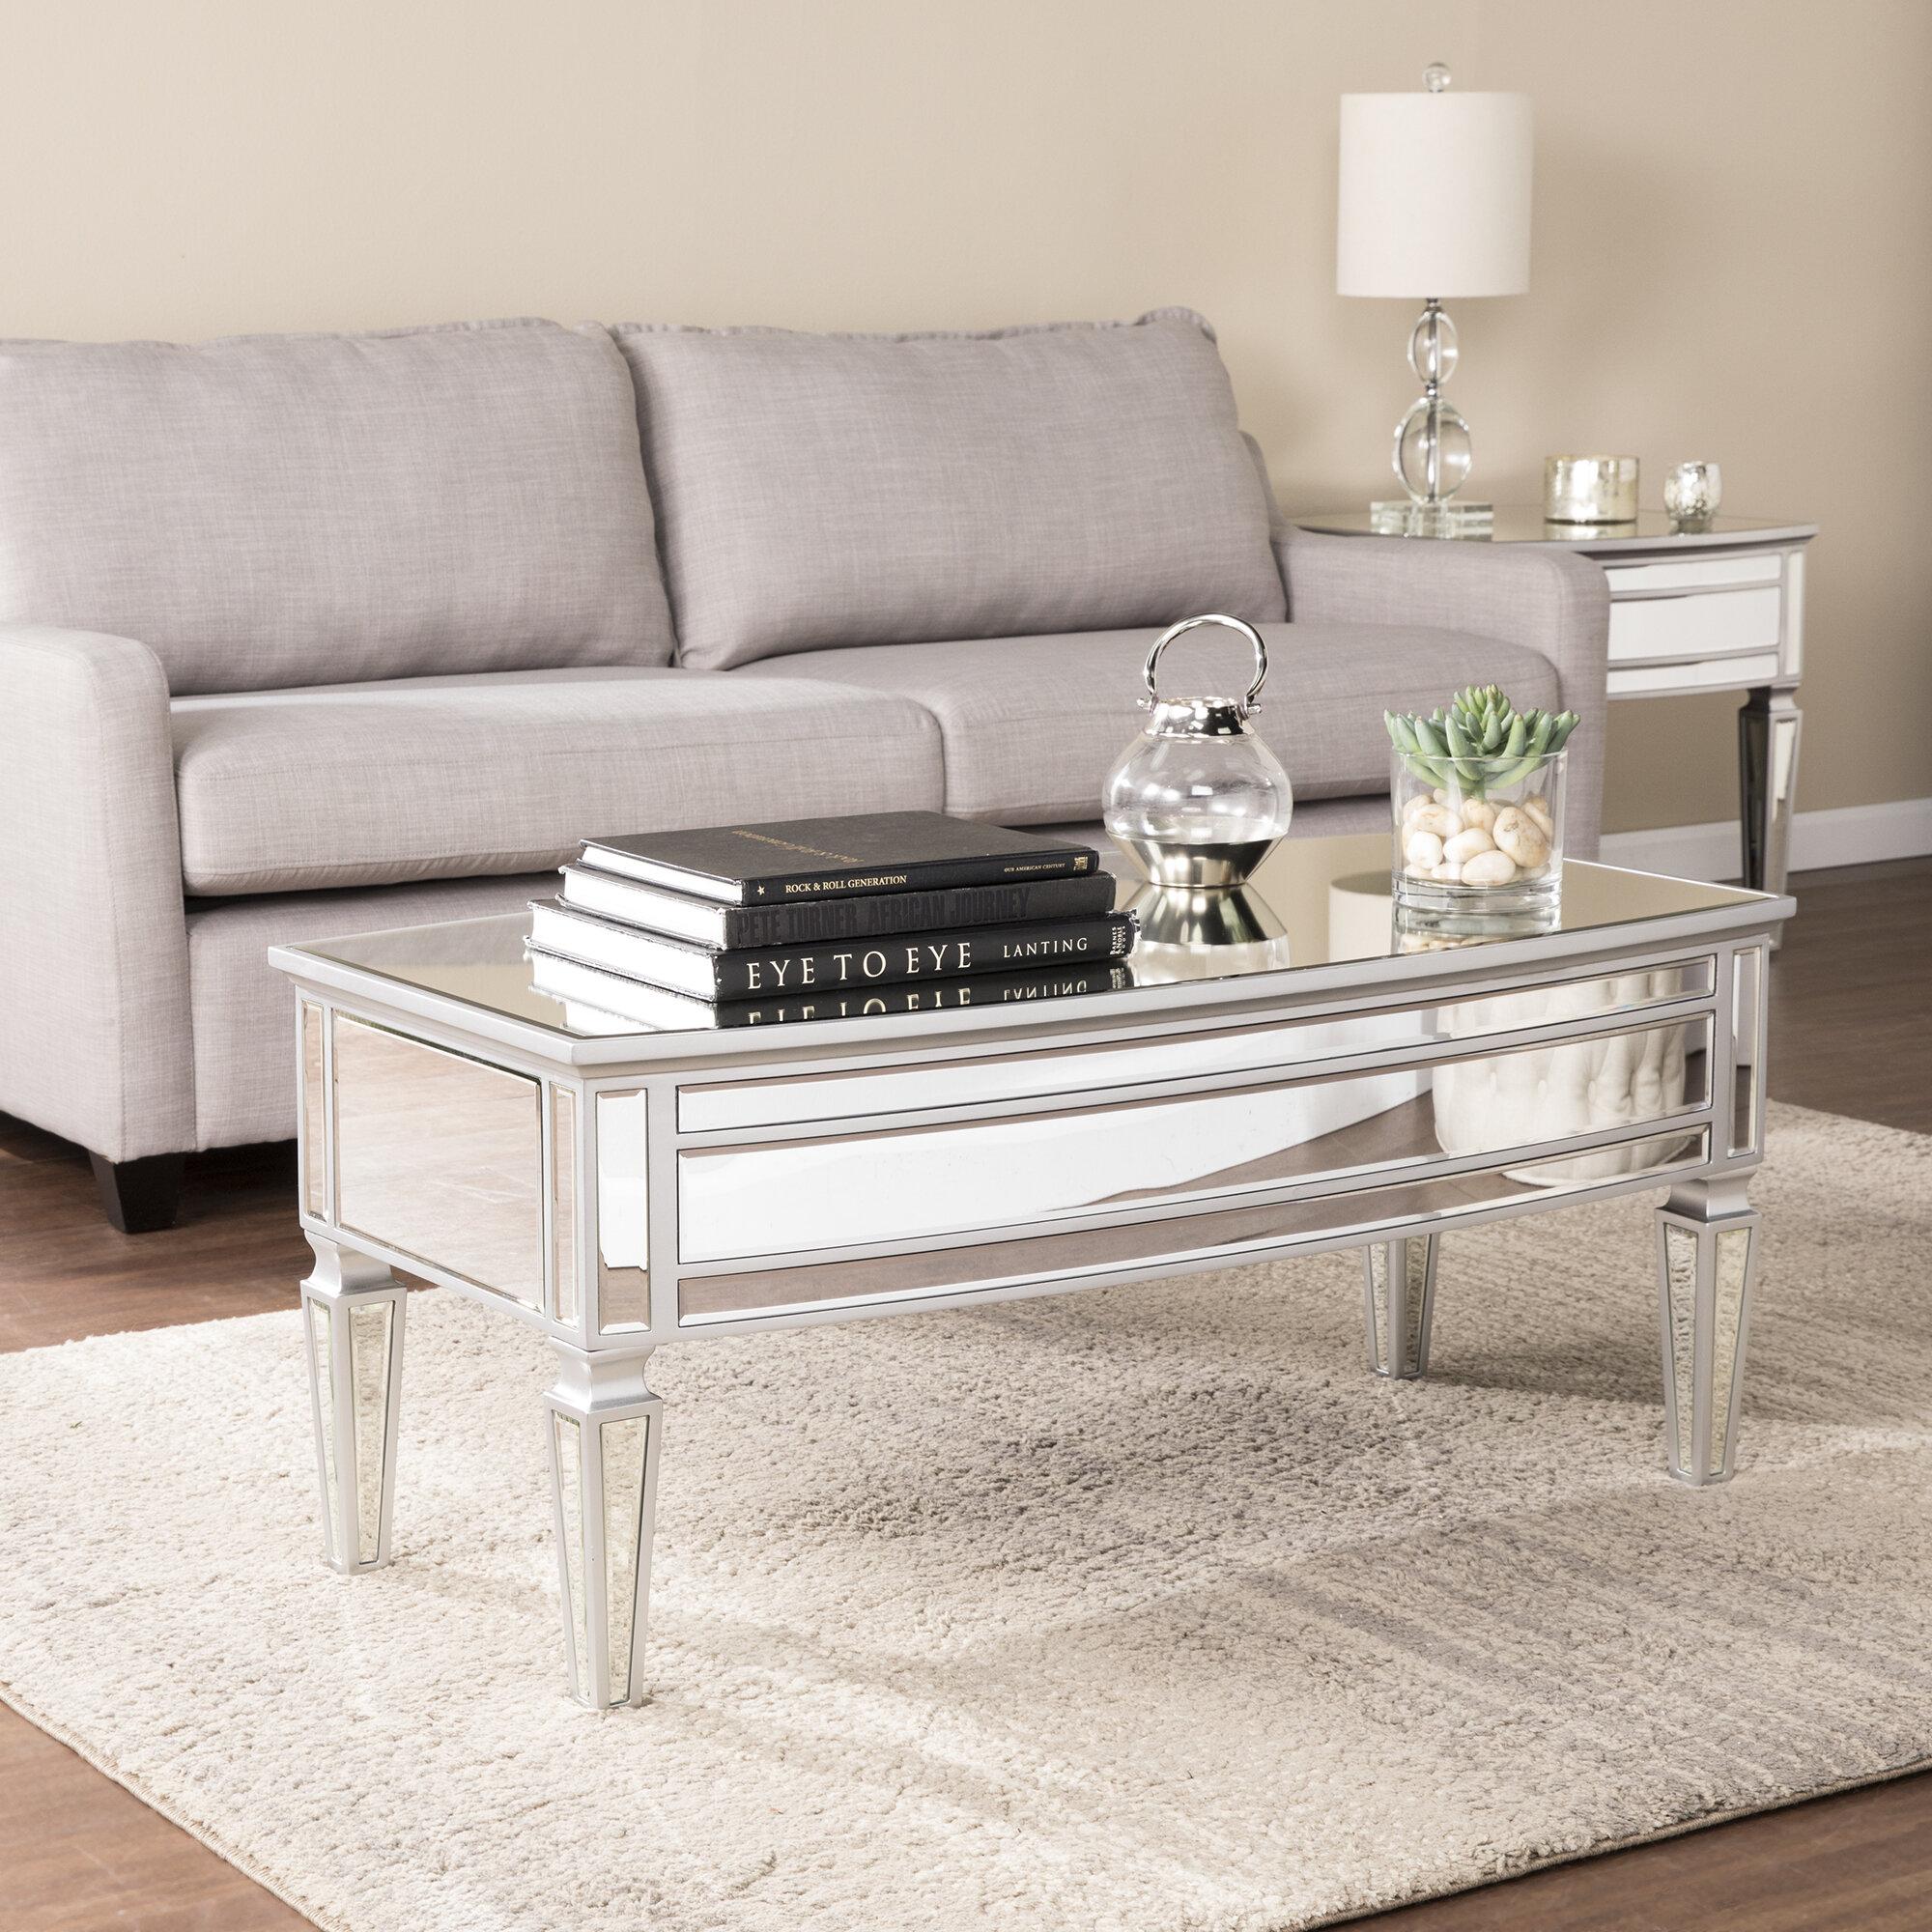 House of hampton elosie 2 piece coffee table set reviews wayfair